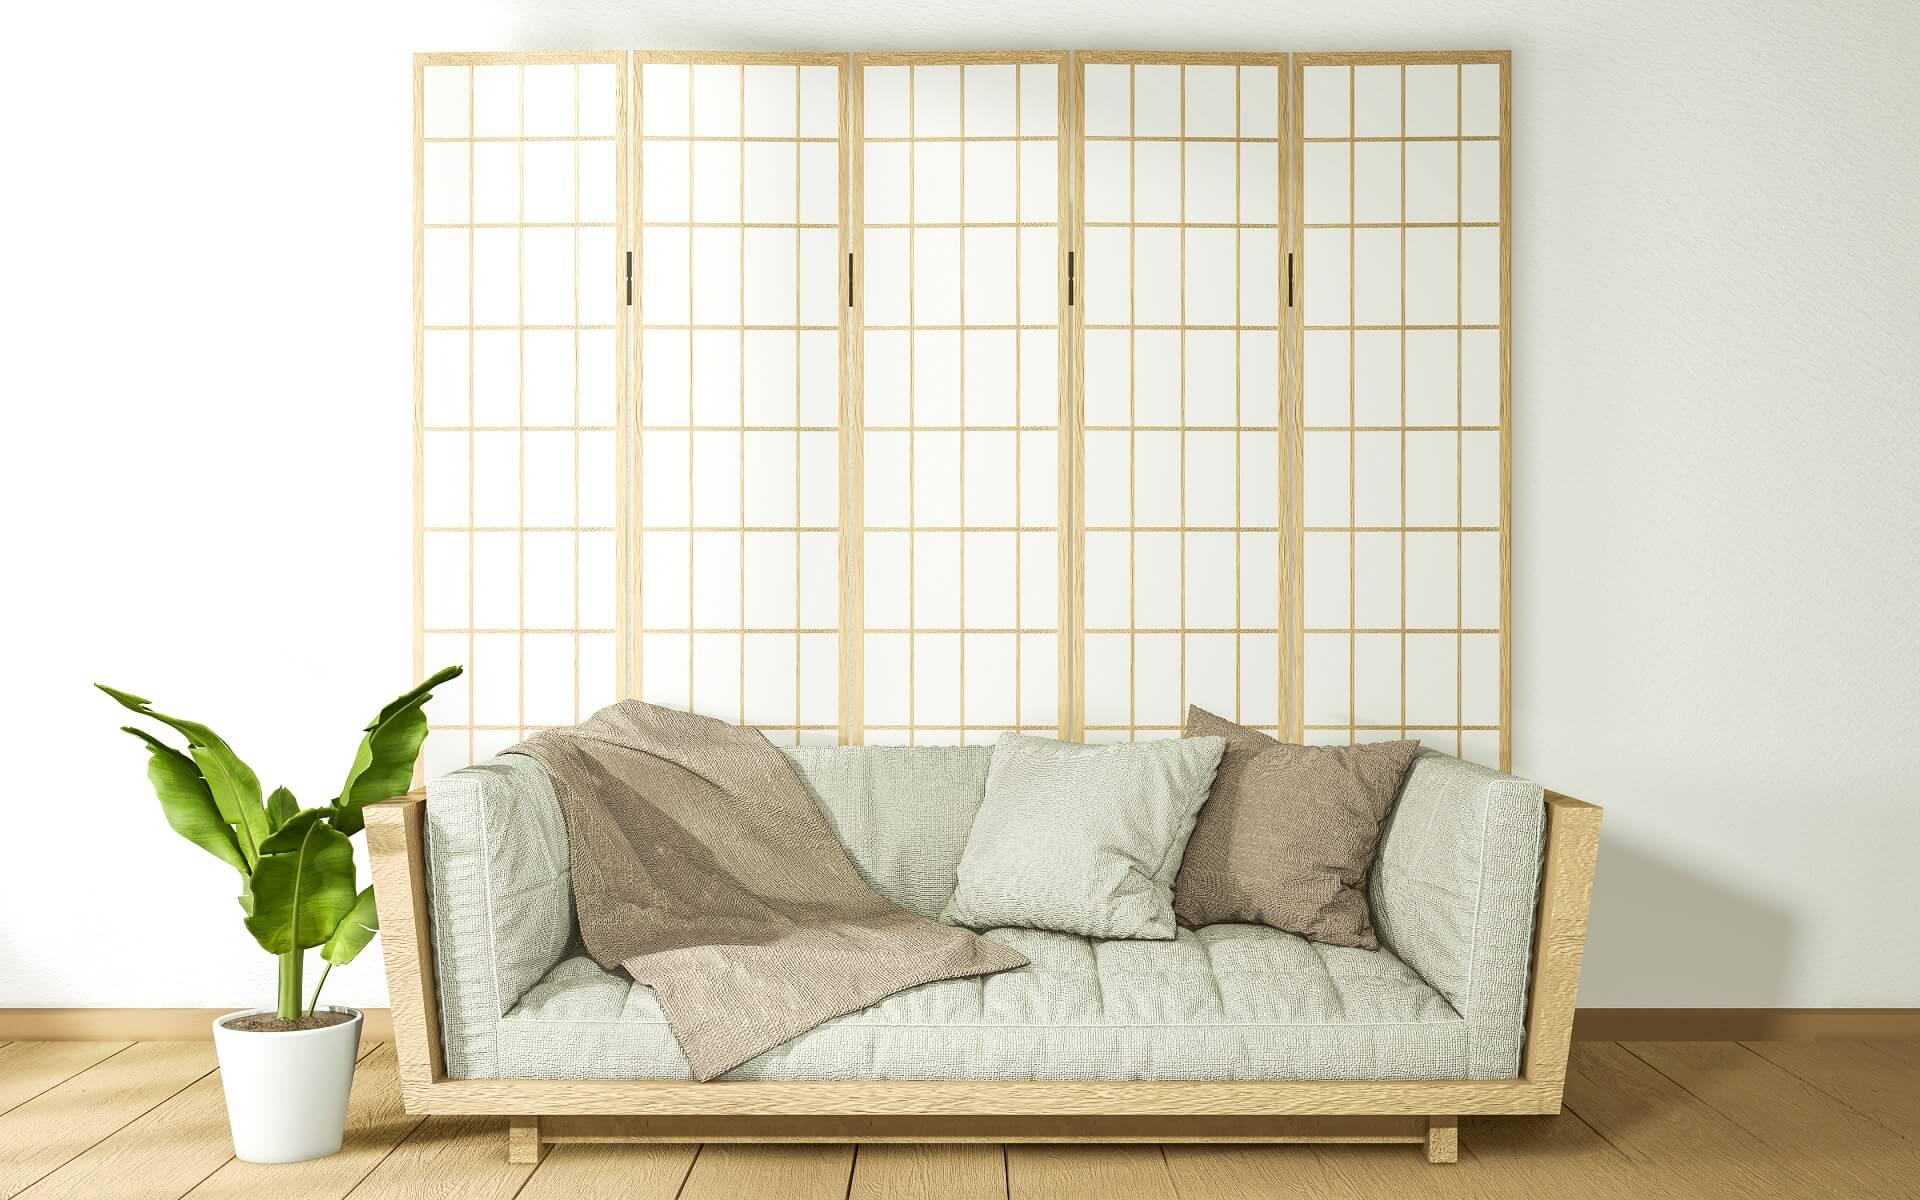 Japanese-style living room: interior design ideas